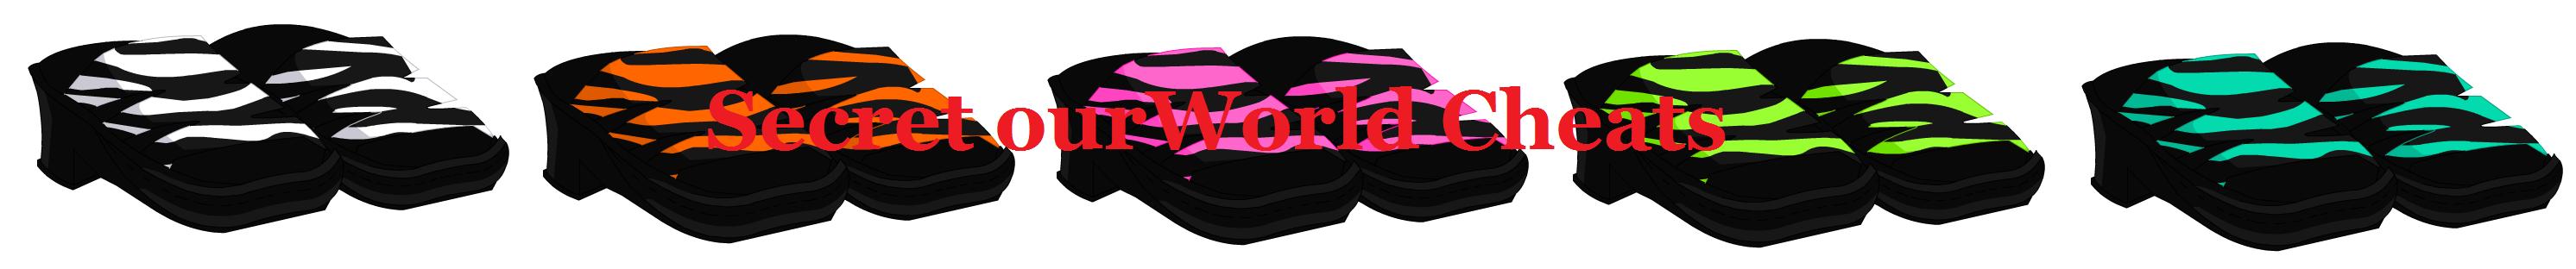 Zebra Print Sandals